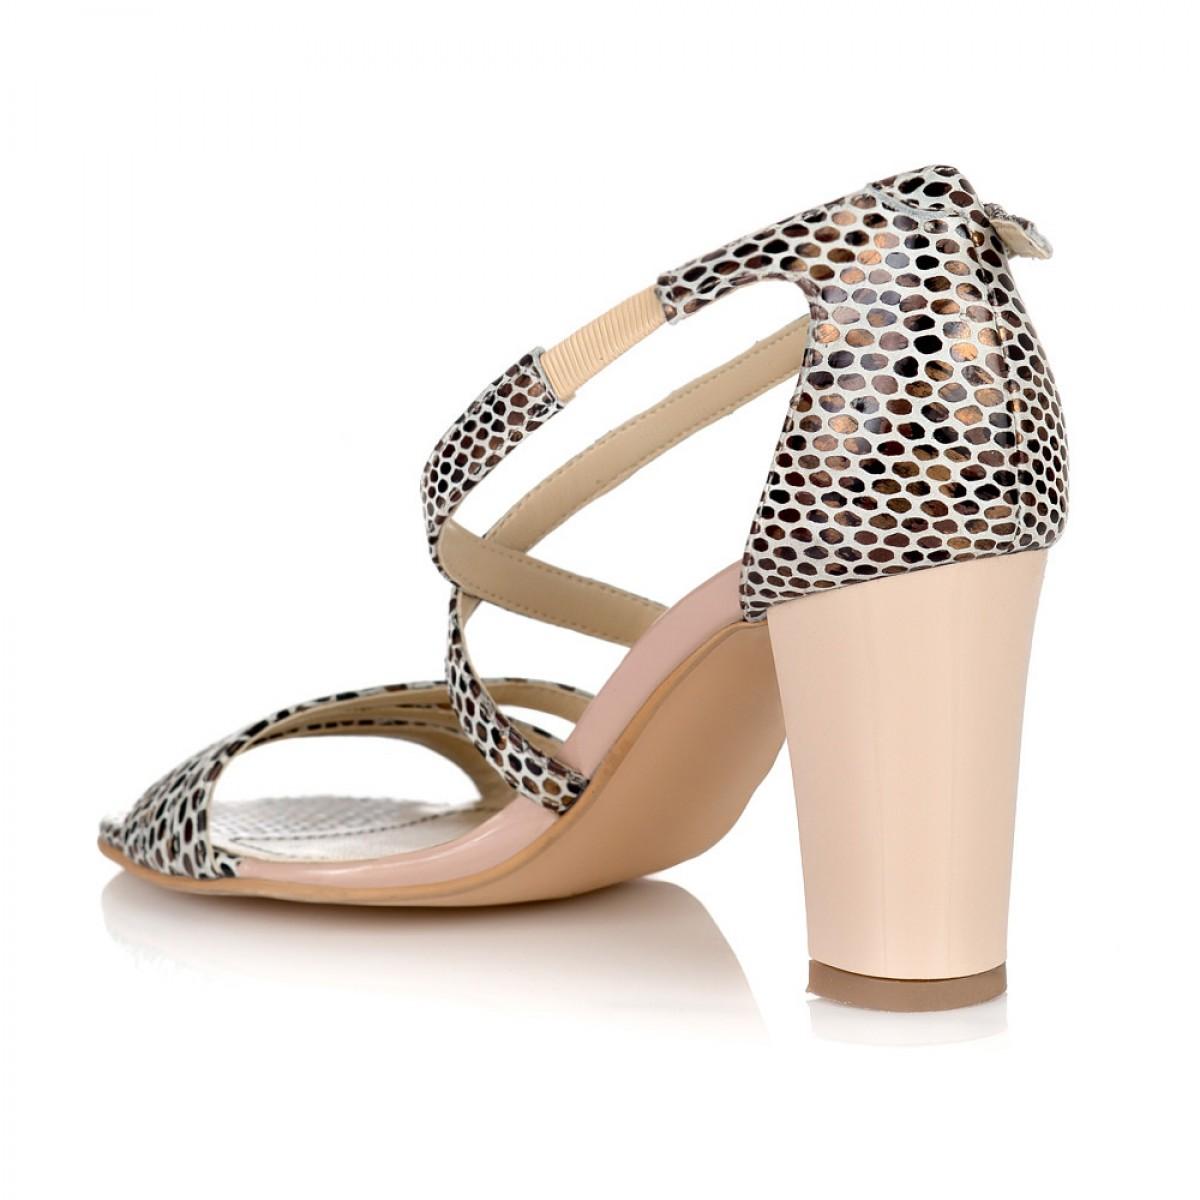 556ed93c54 Sandale Dama Piele Naturala Bej Sarpe